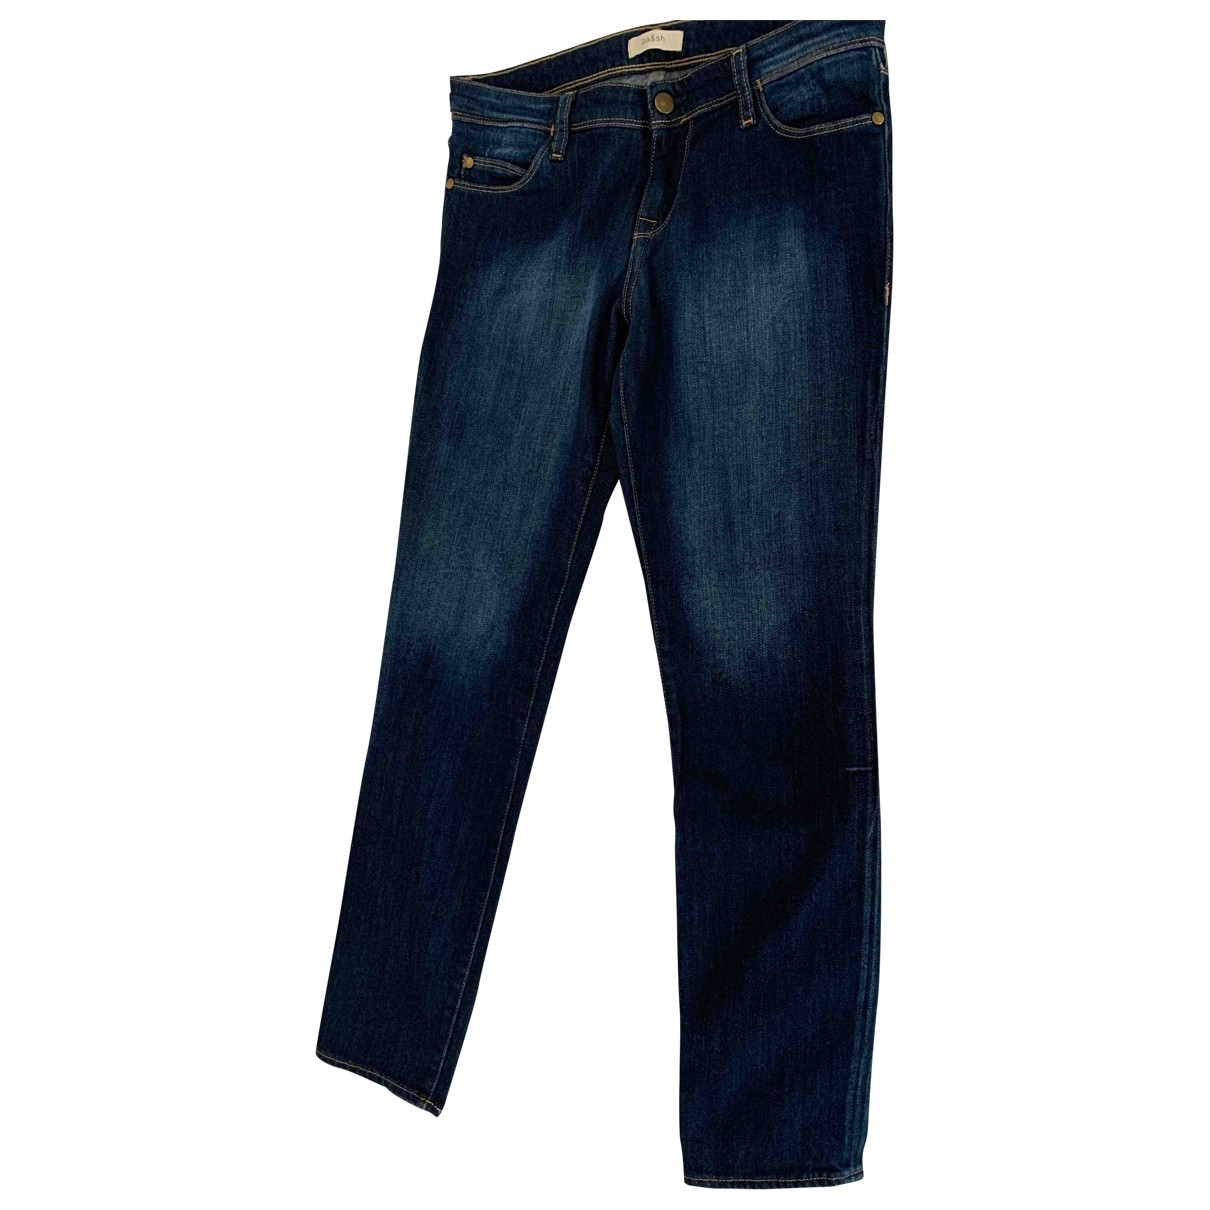 Ba&sh Fall Winter 2019 Blue Cotton - elasthane Jeans for Women 26 US